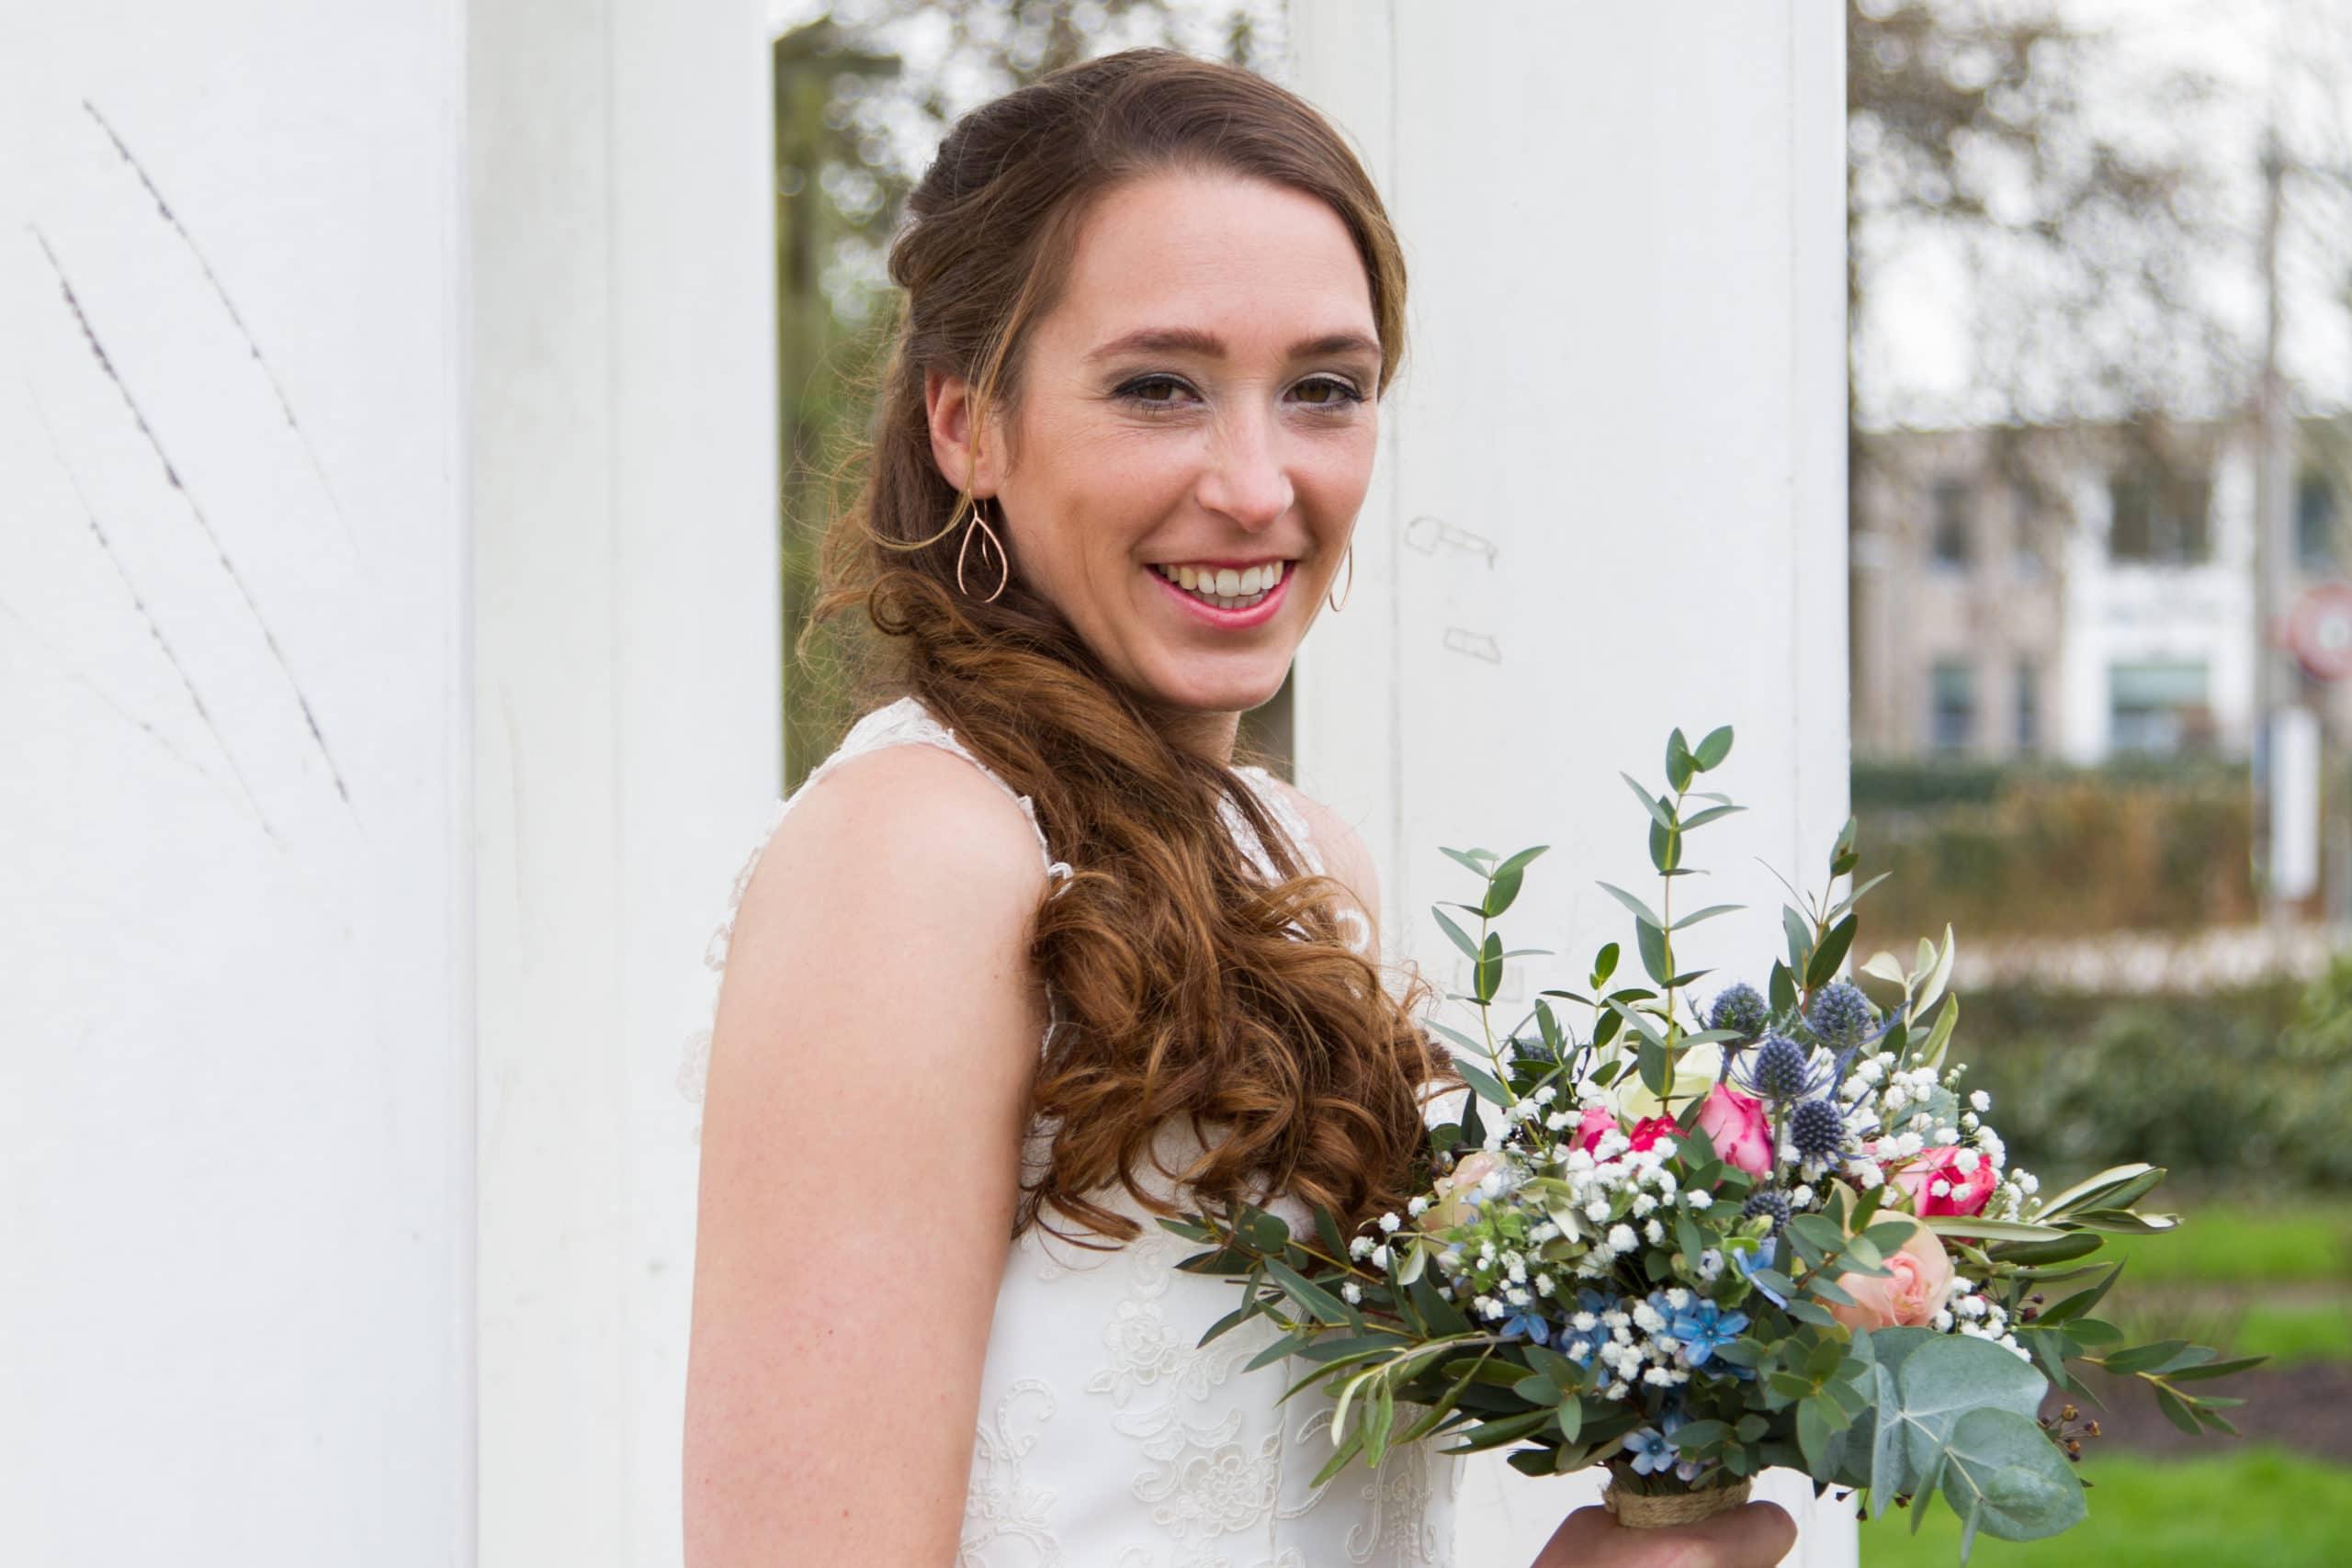 Oogst trouwsieraden en Kl!k Foto's